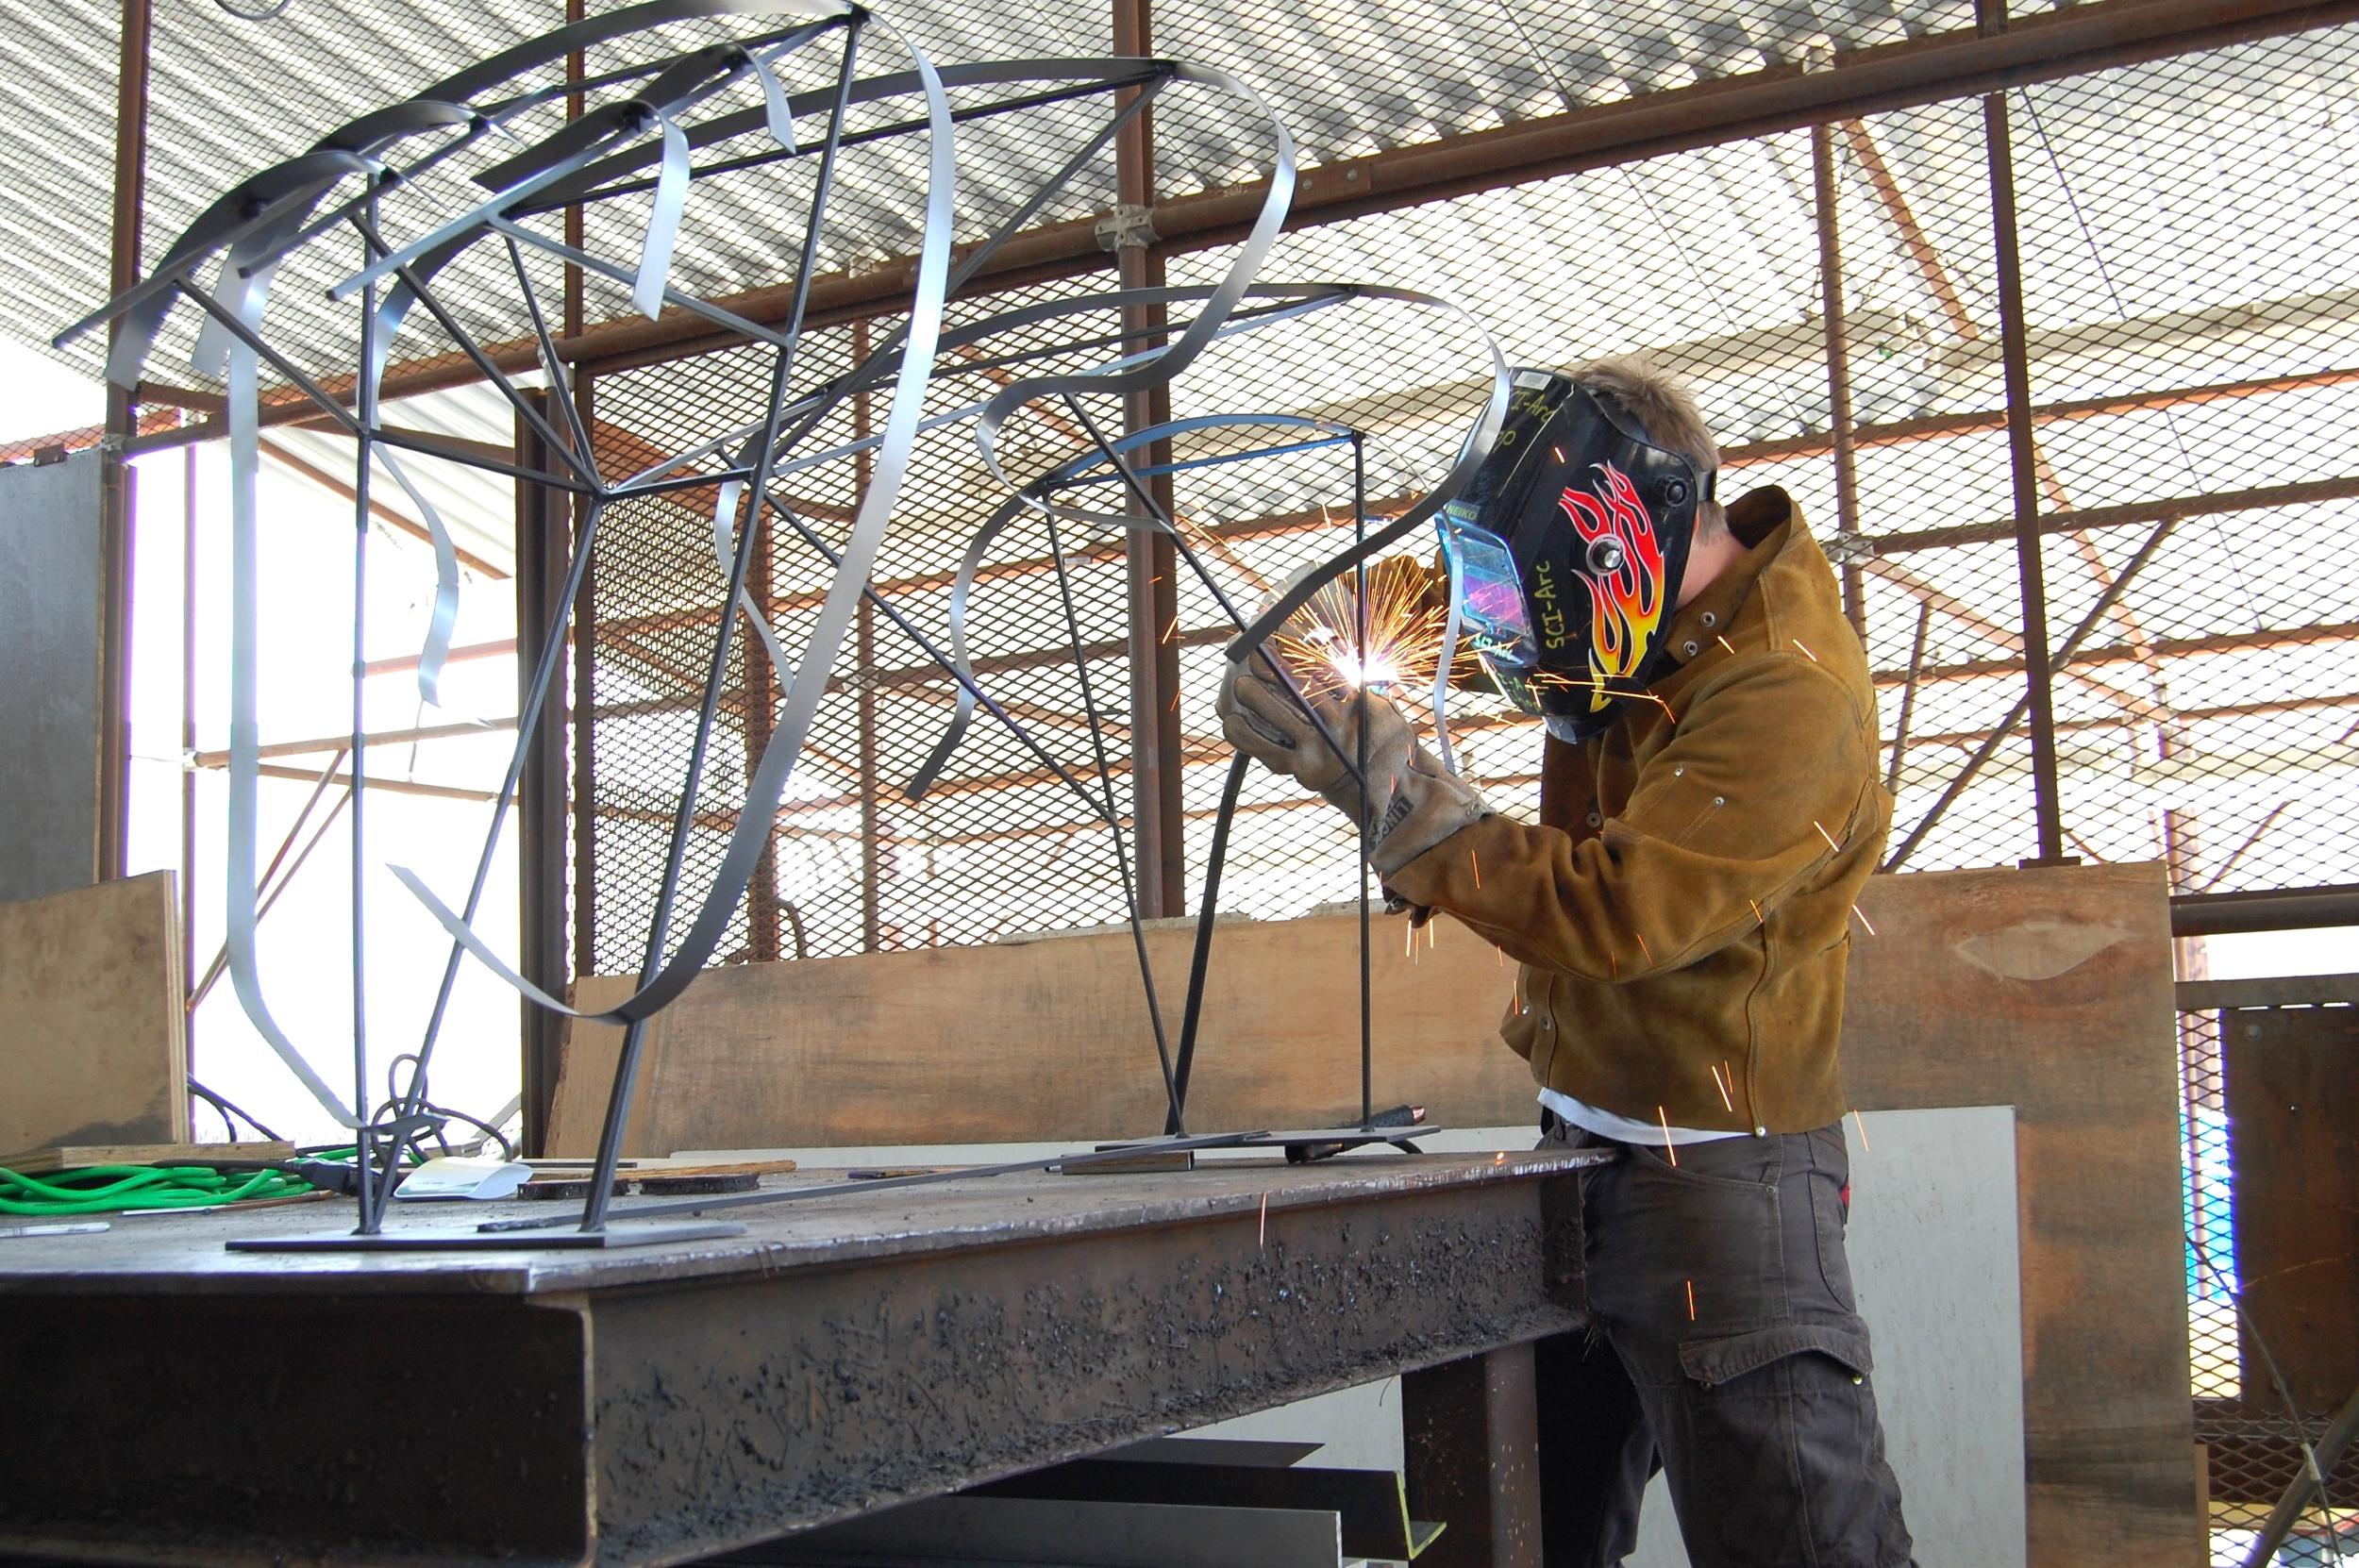 _sculpture fabrication